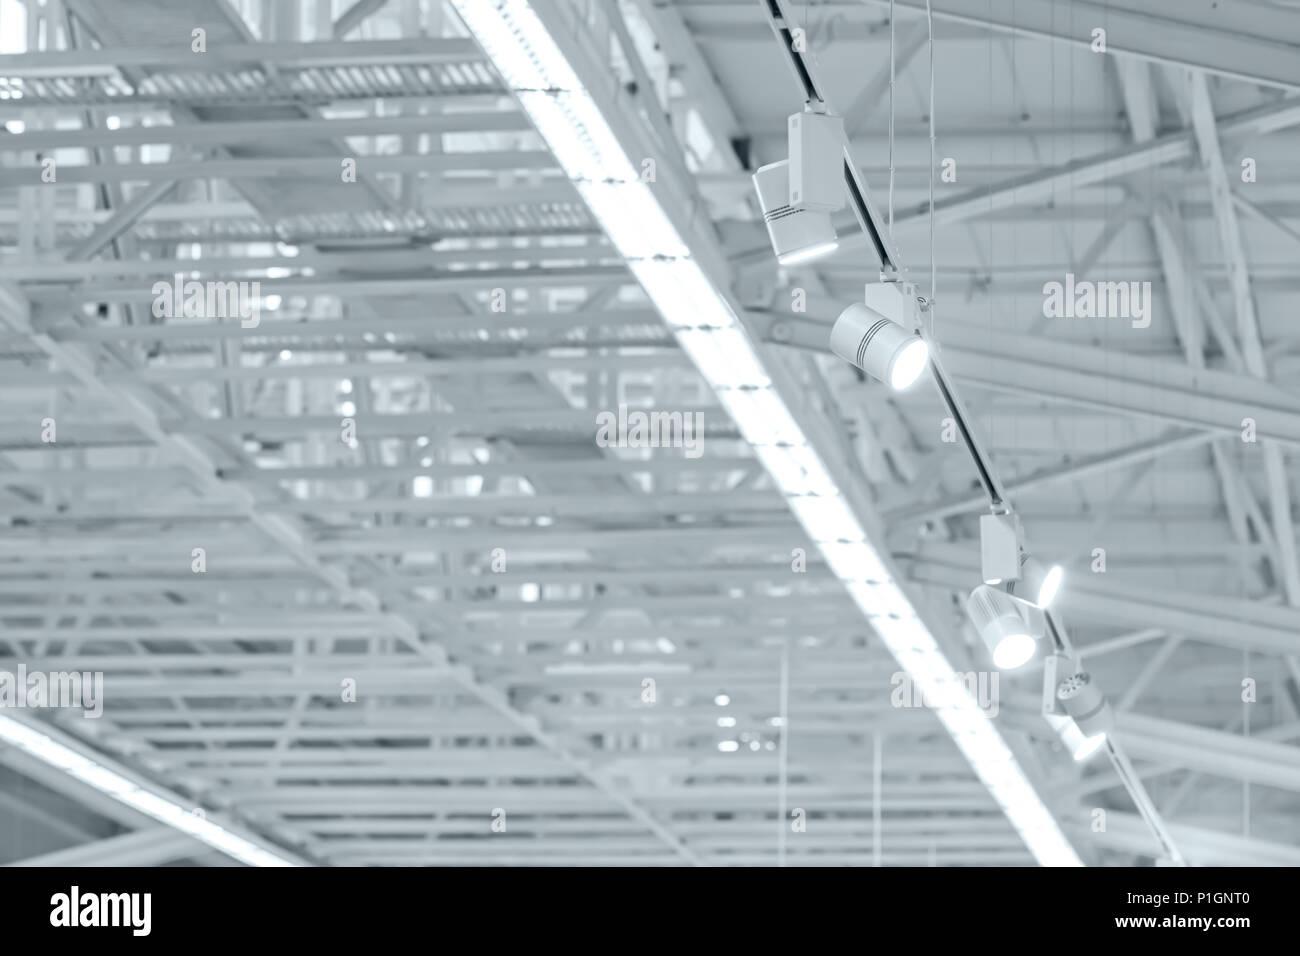 Steel Roof Truss Stockfotos & Steel Roof Truss Bilder - Seite 2 - Alamy